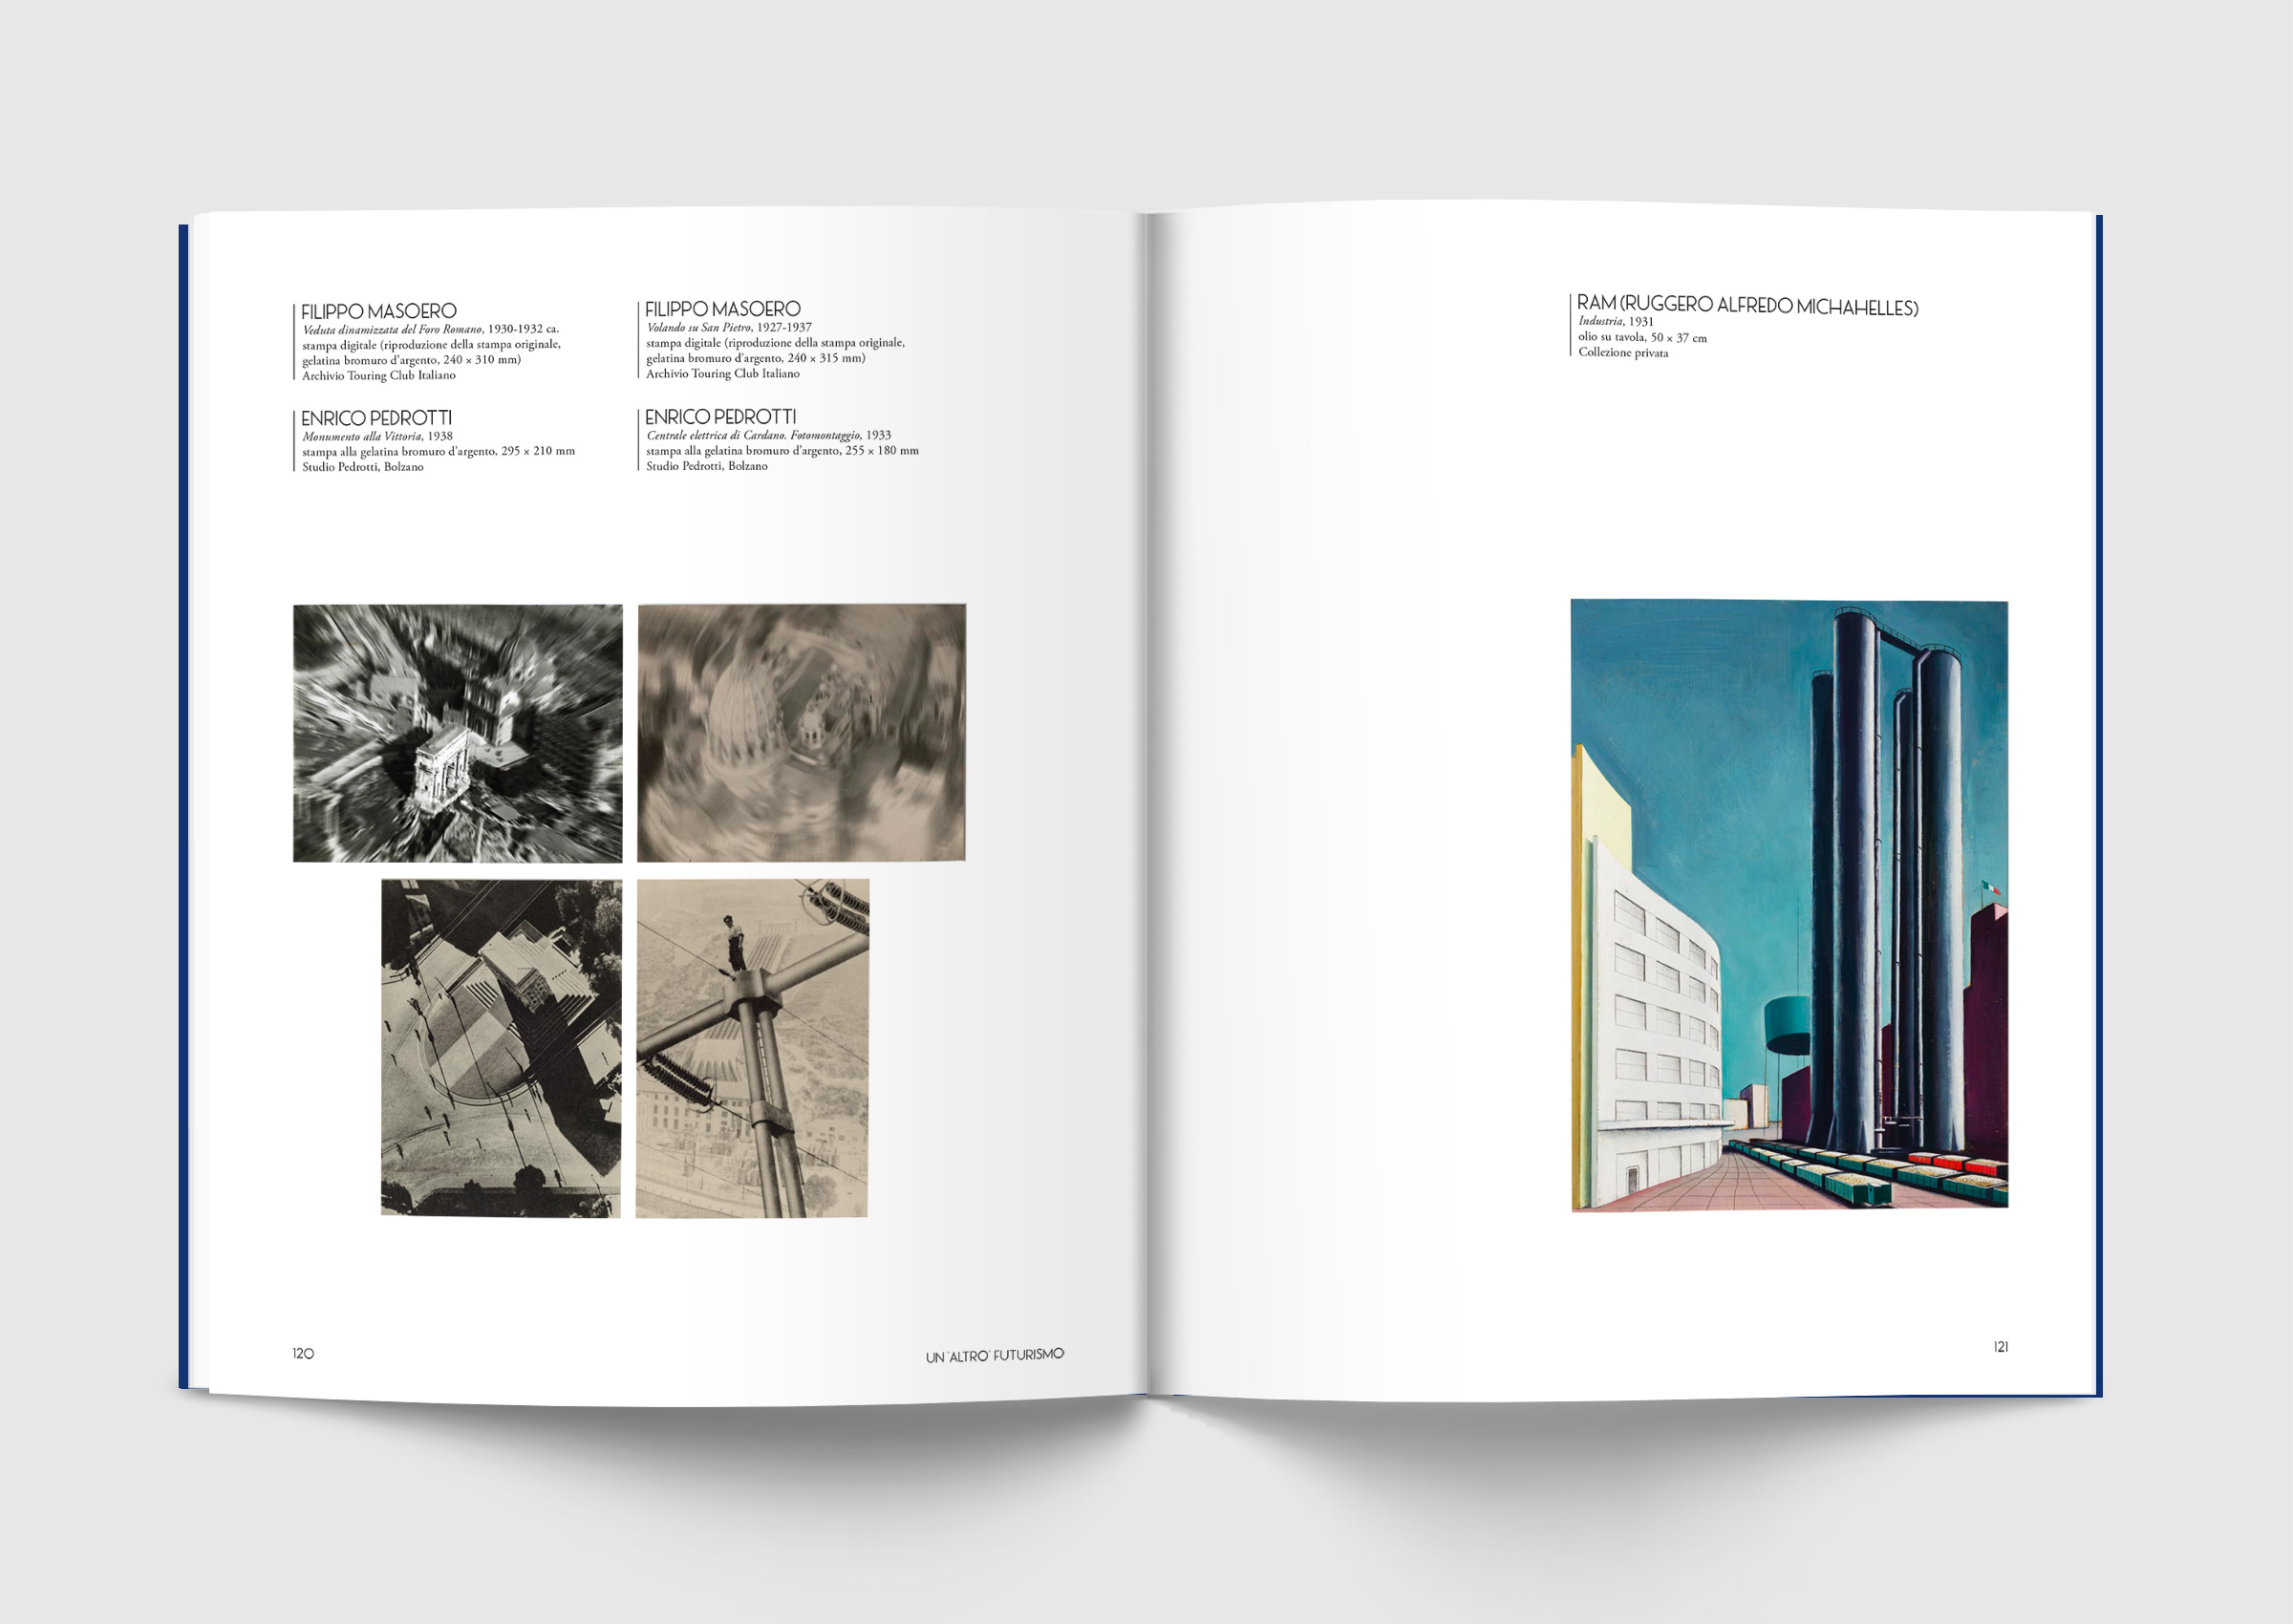 Catalogo Mostra, Arcadia Apocalisse, Palp, Pontedera, Design, Deferrari Modesti, RAM, Pedrotti, Masoero